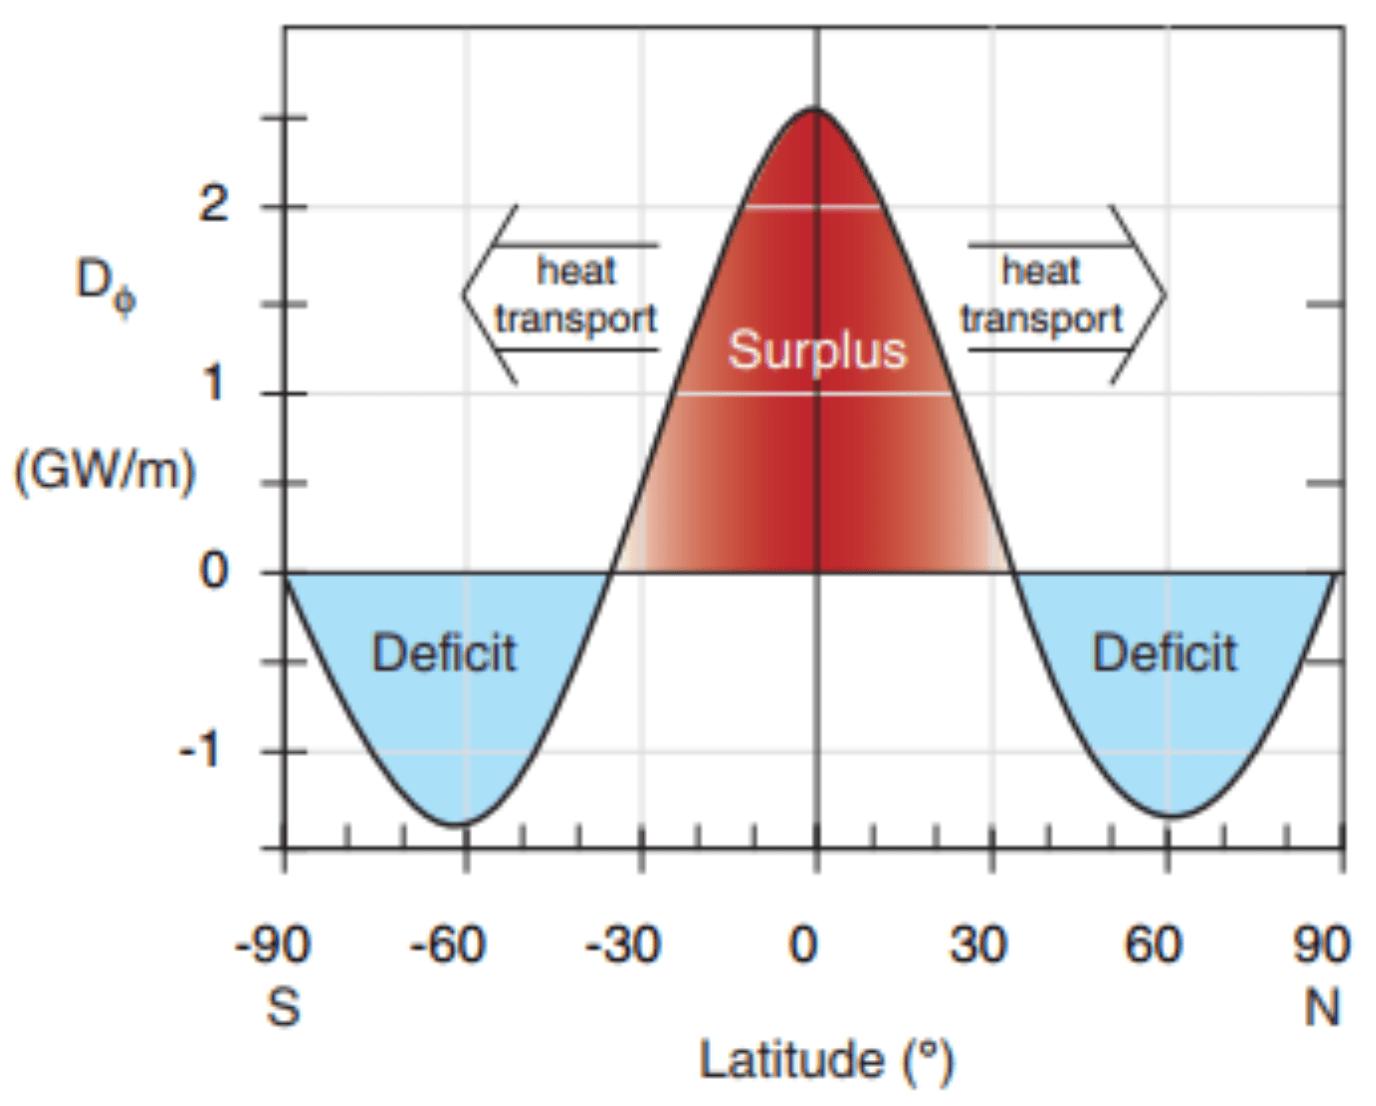 hight resolution of heat transport balances the net radiative imbalances cc by nc sa 4 0